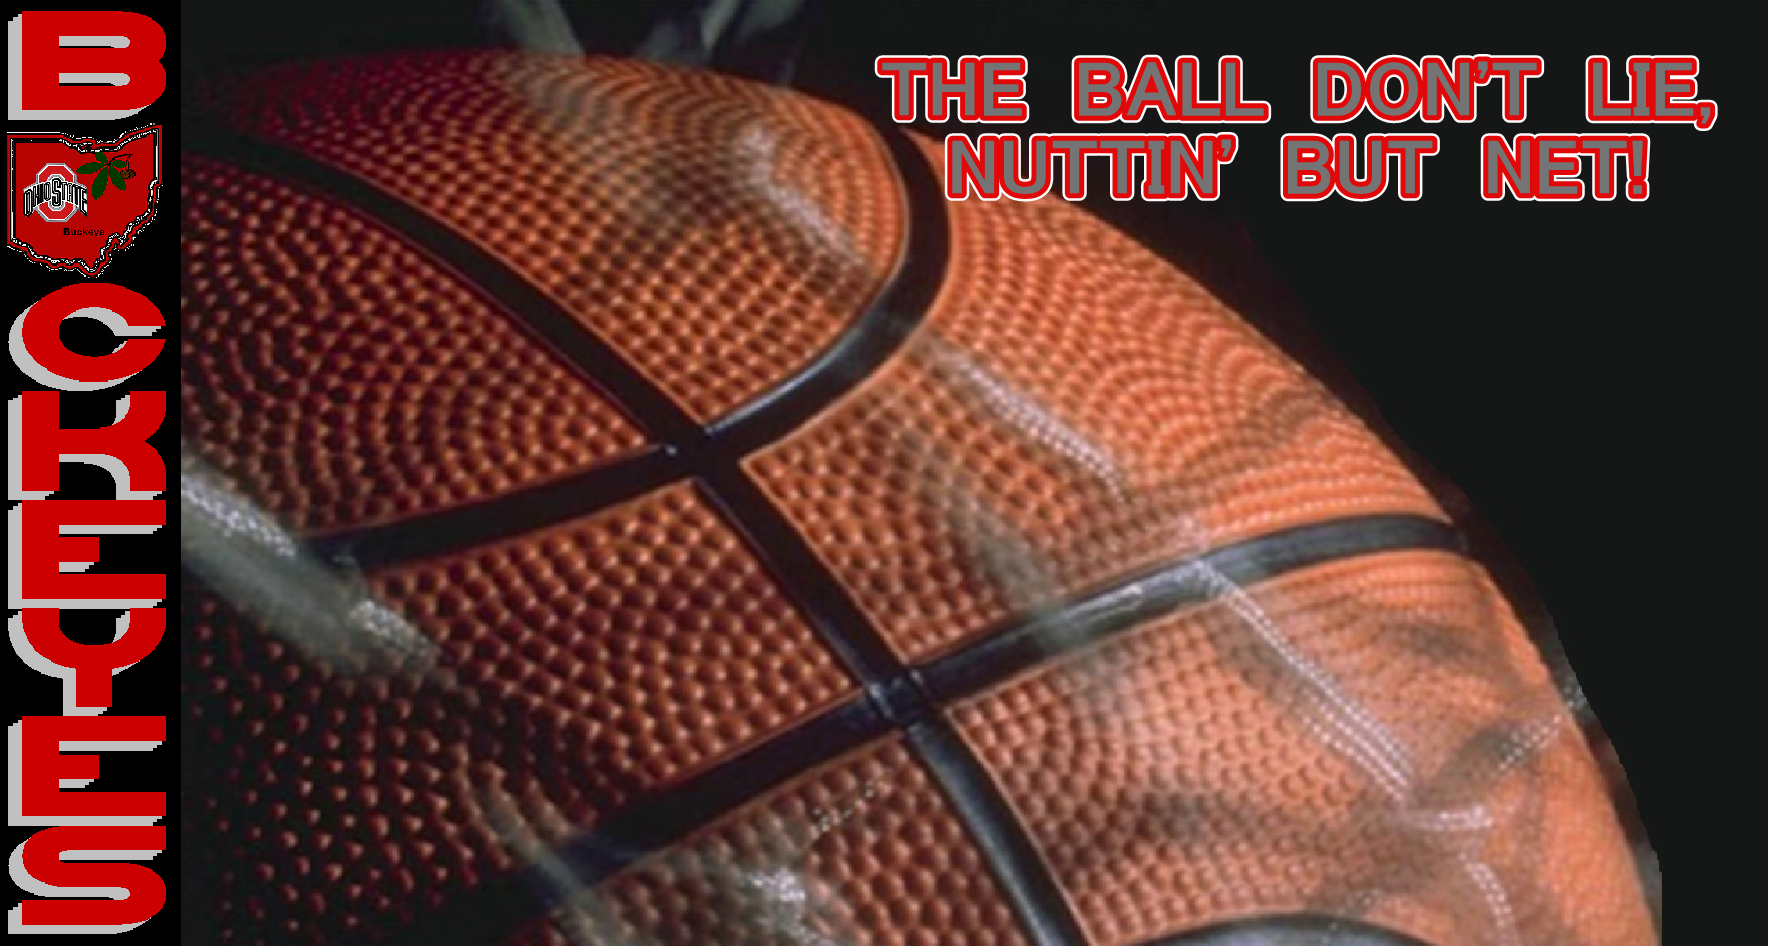 THE BALL DON'T LIE